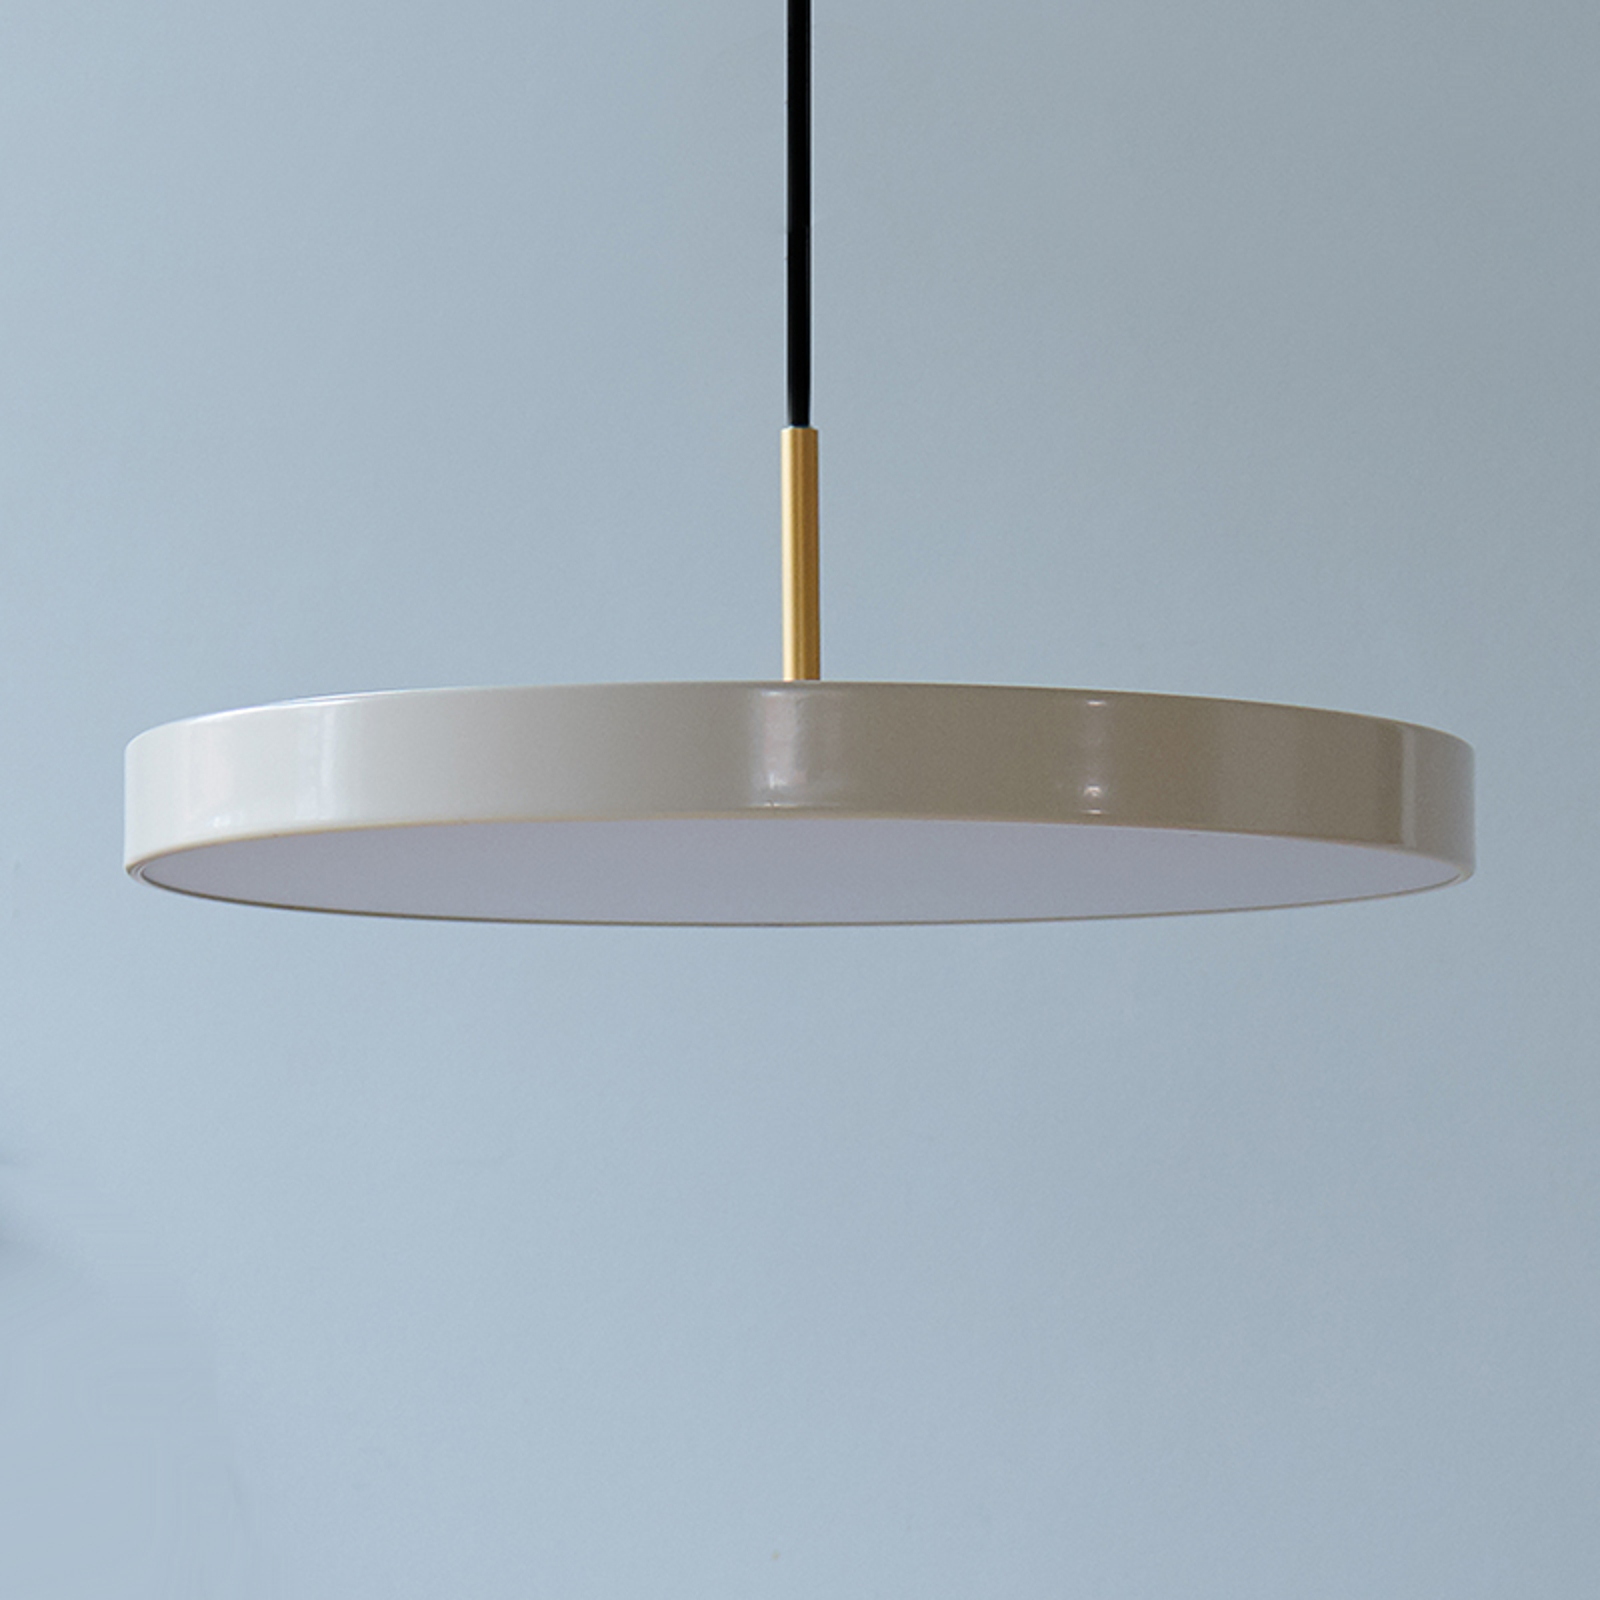 UMAGE Asteria mini sospensione LED, perla